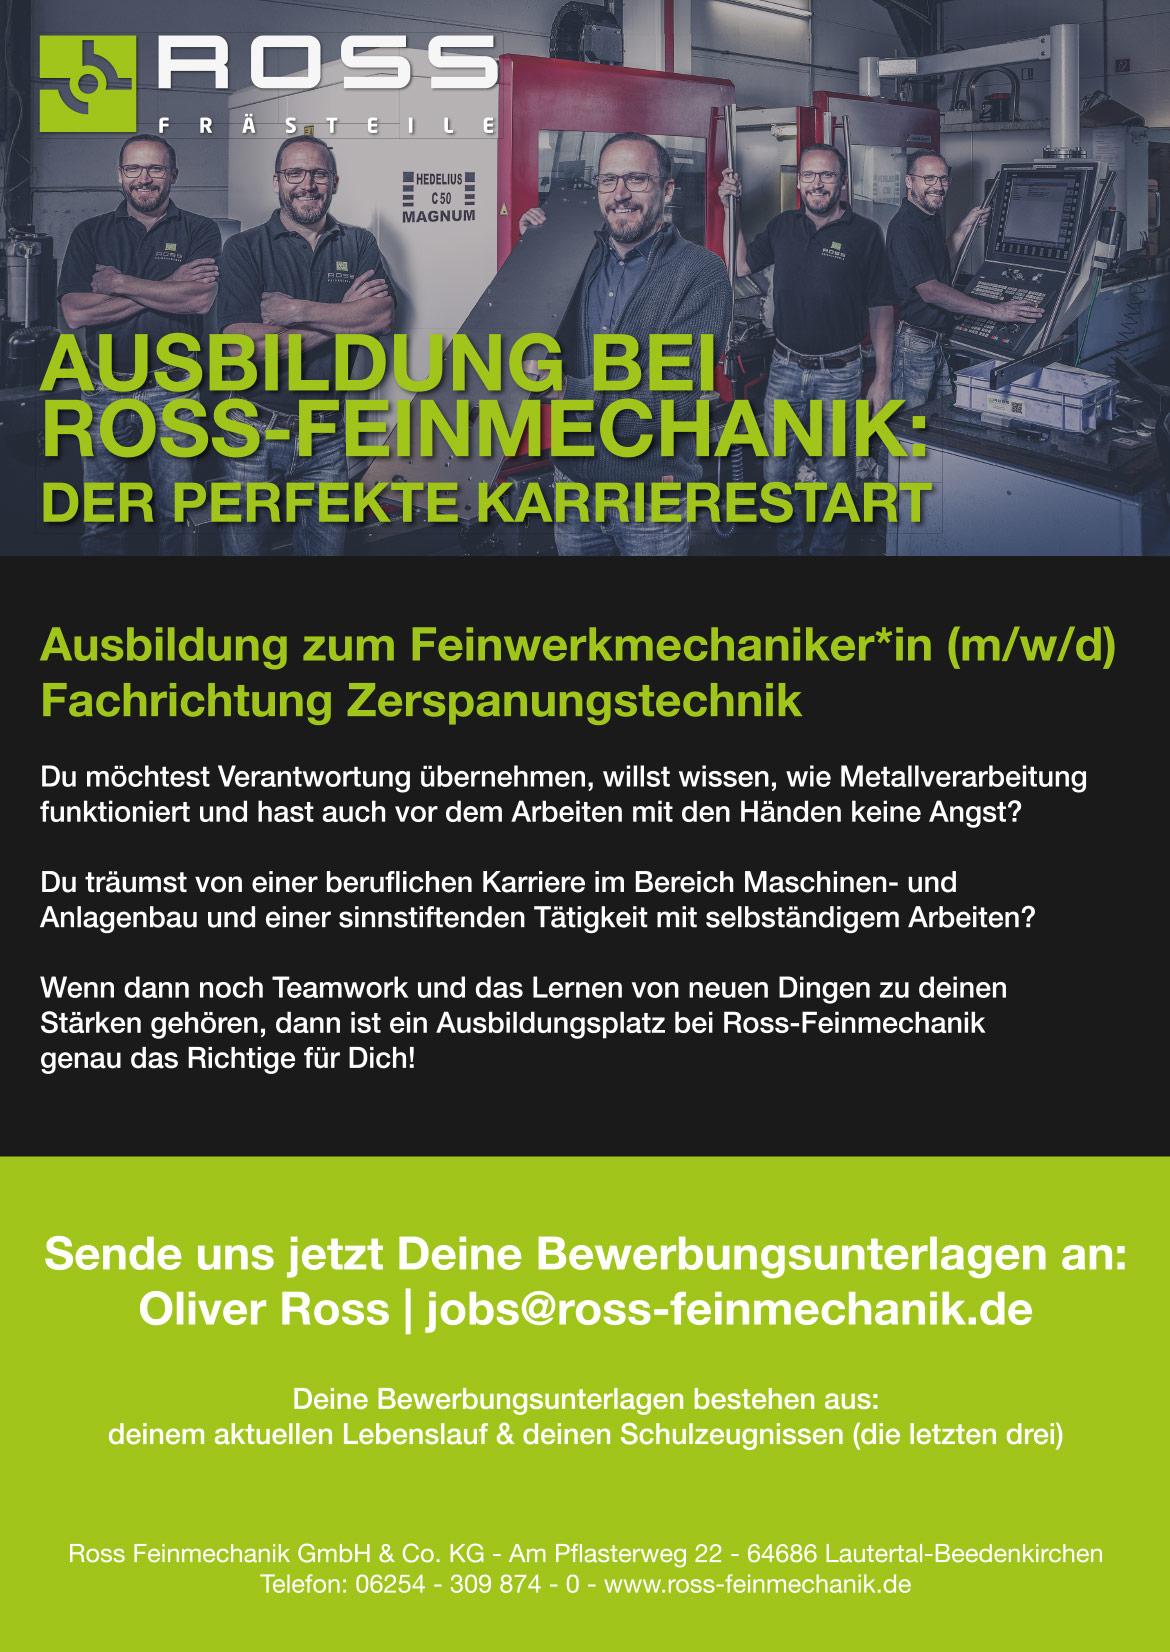 Ausbildungsplakat: Ross Feinmechanik GmbH & CO. KG